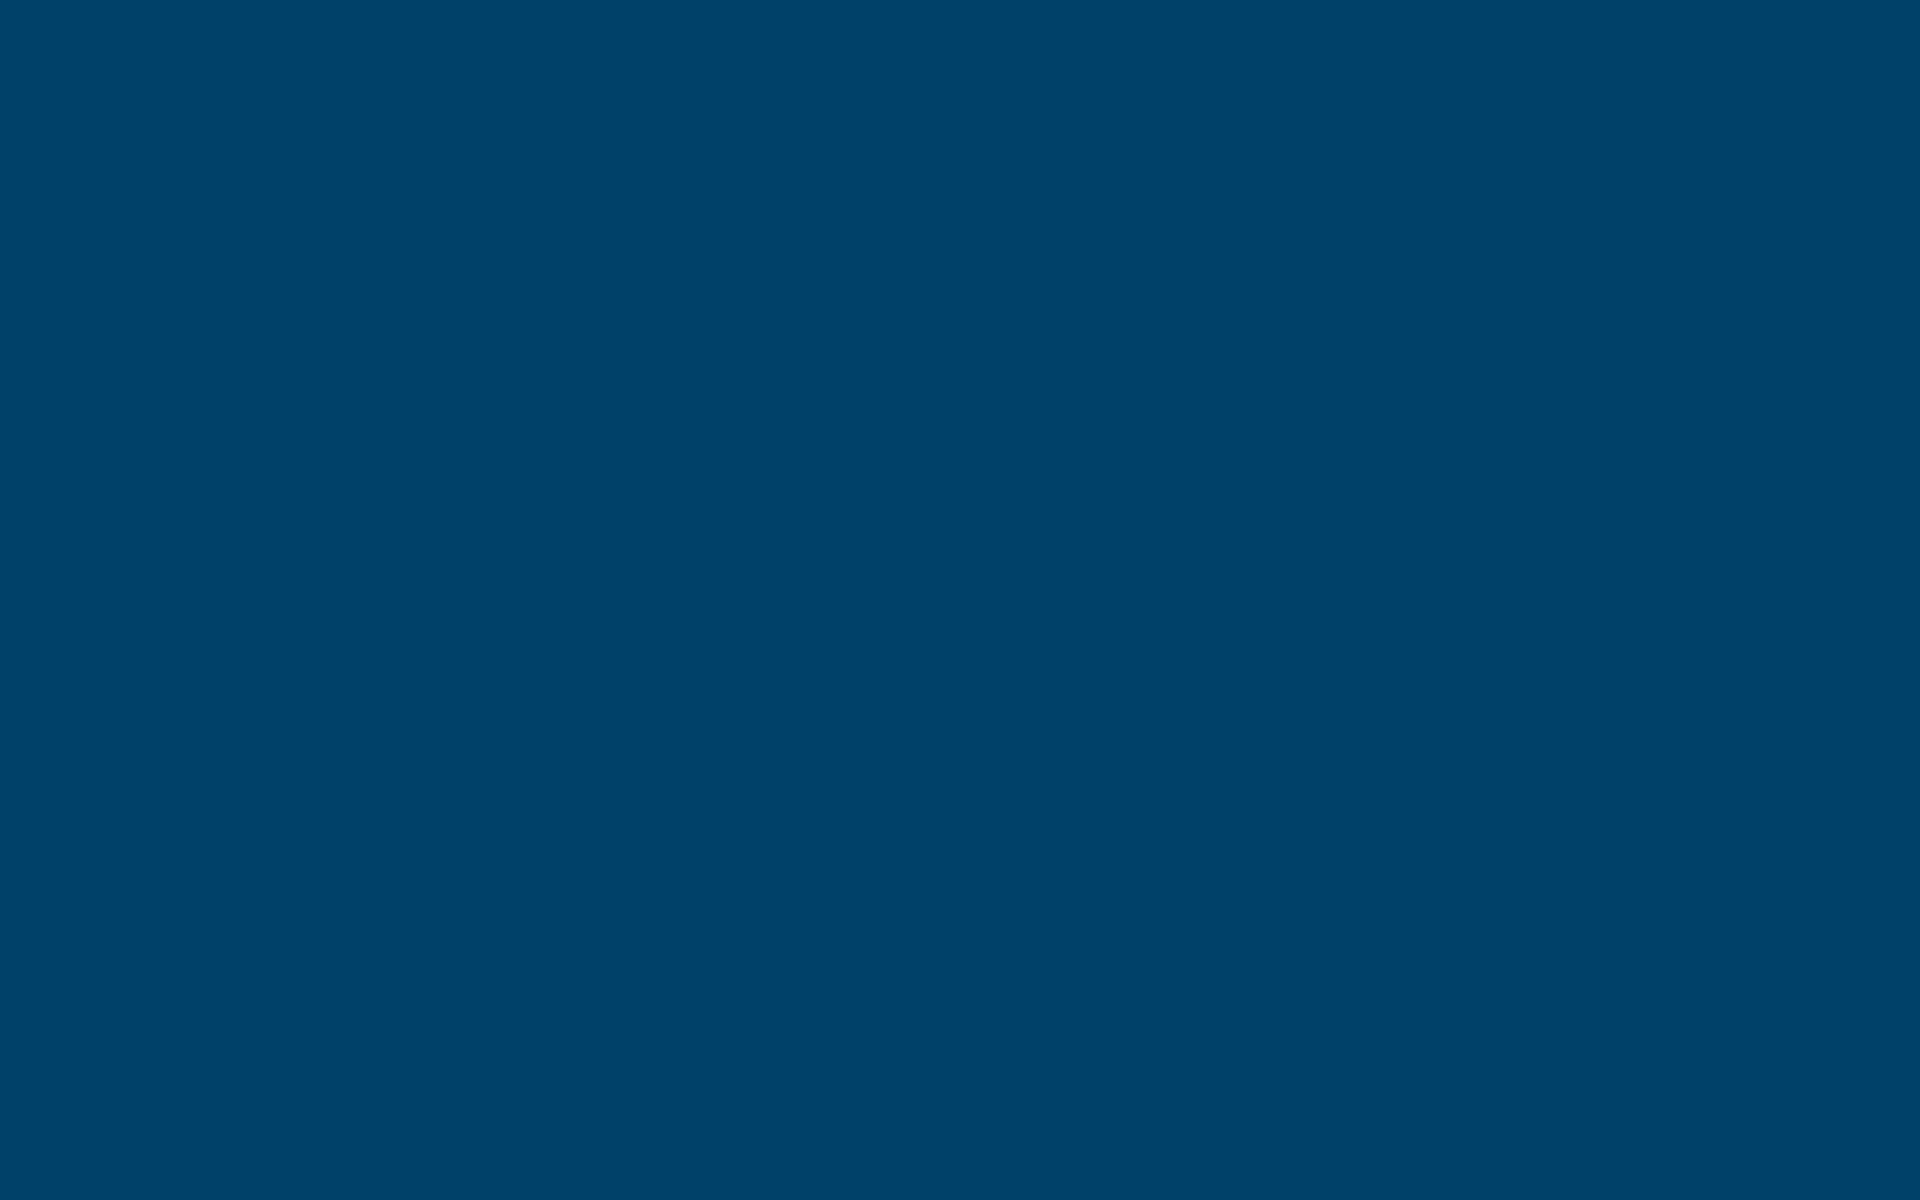 1920x1200 Indigo Dye Solid Color Background